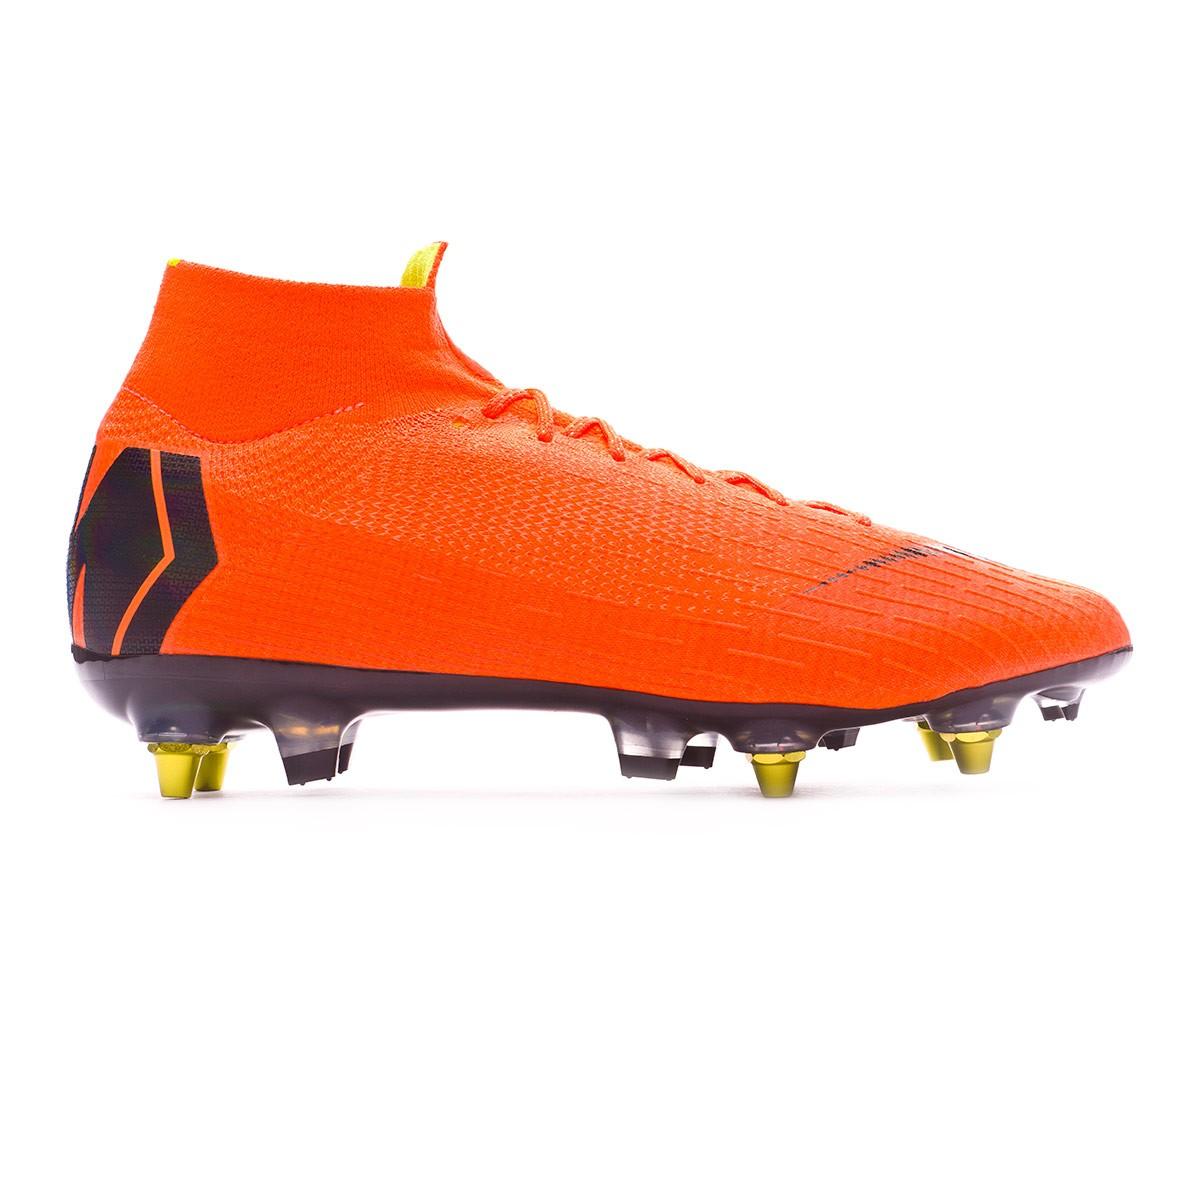 online store a24a8 237b2 Football Boots Nike Mercurial Superfly VI Elite SG-Pro Anti-Clog Total  orange-Black-Volt - Football store Fútbol Emotion